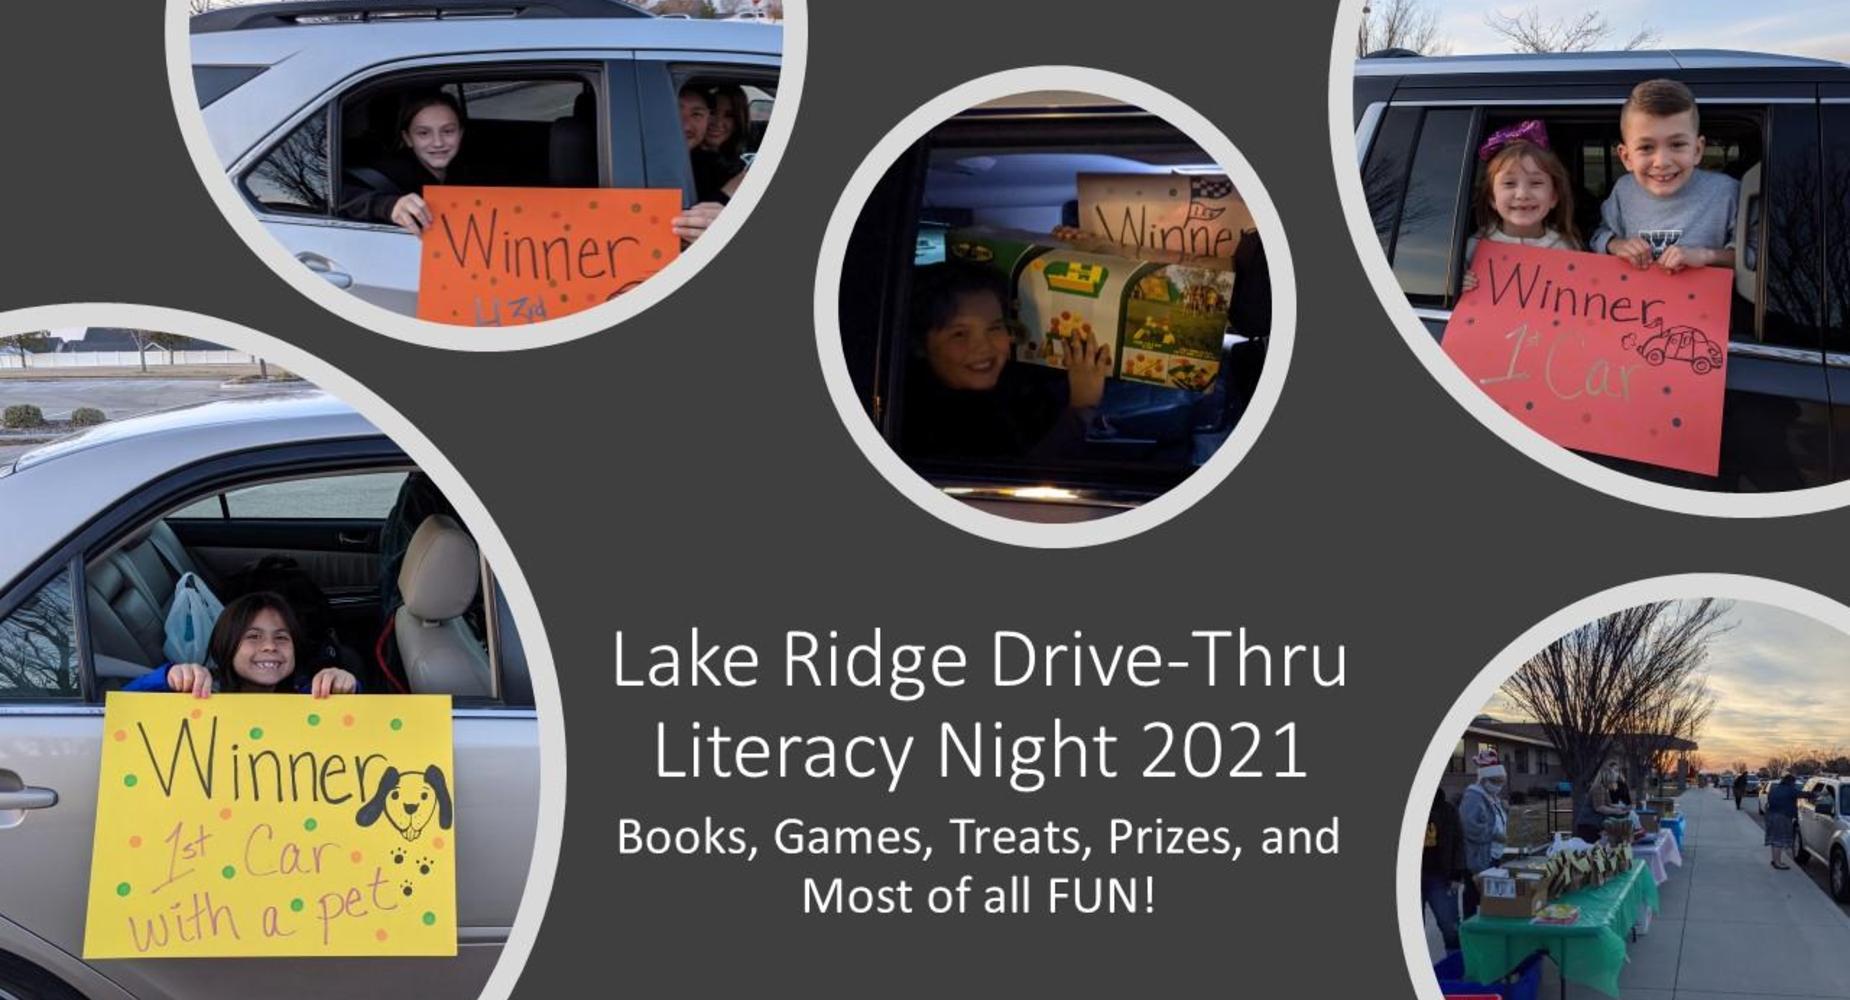 Literacy Night 2021